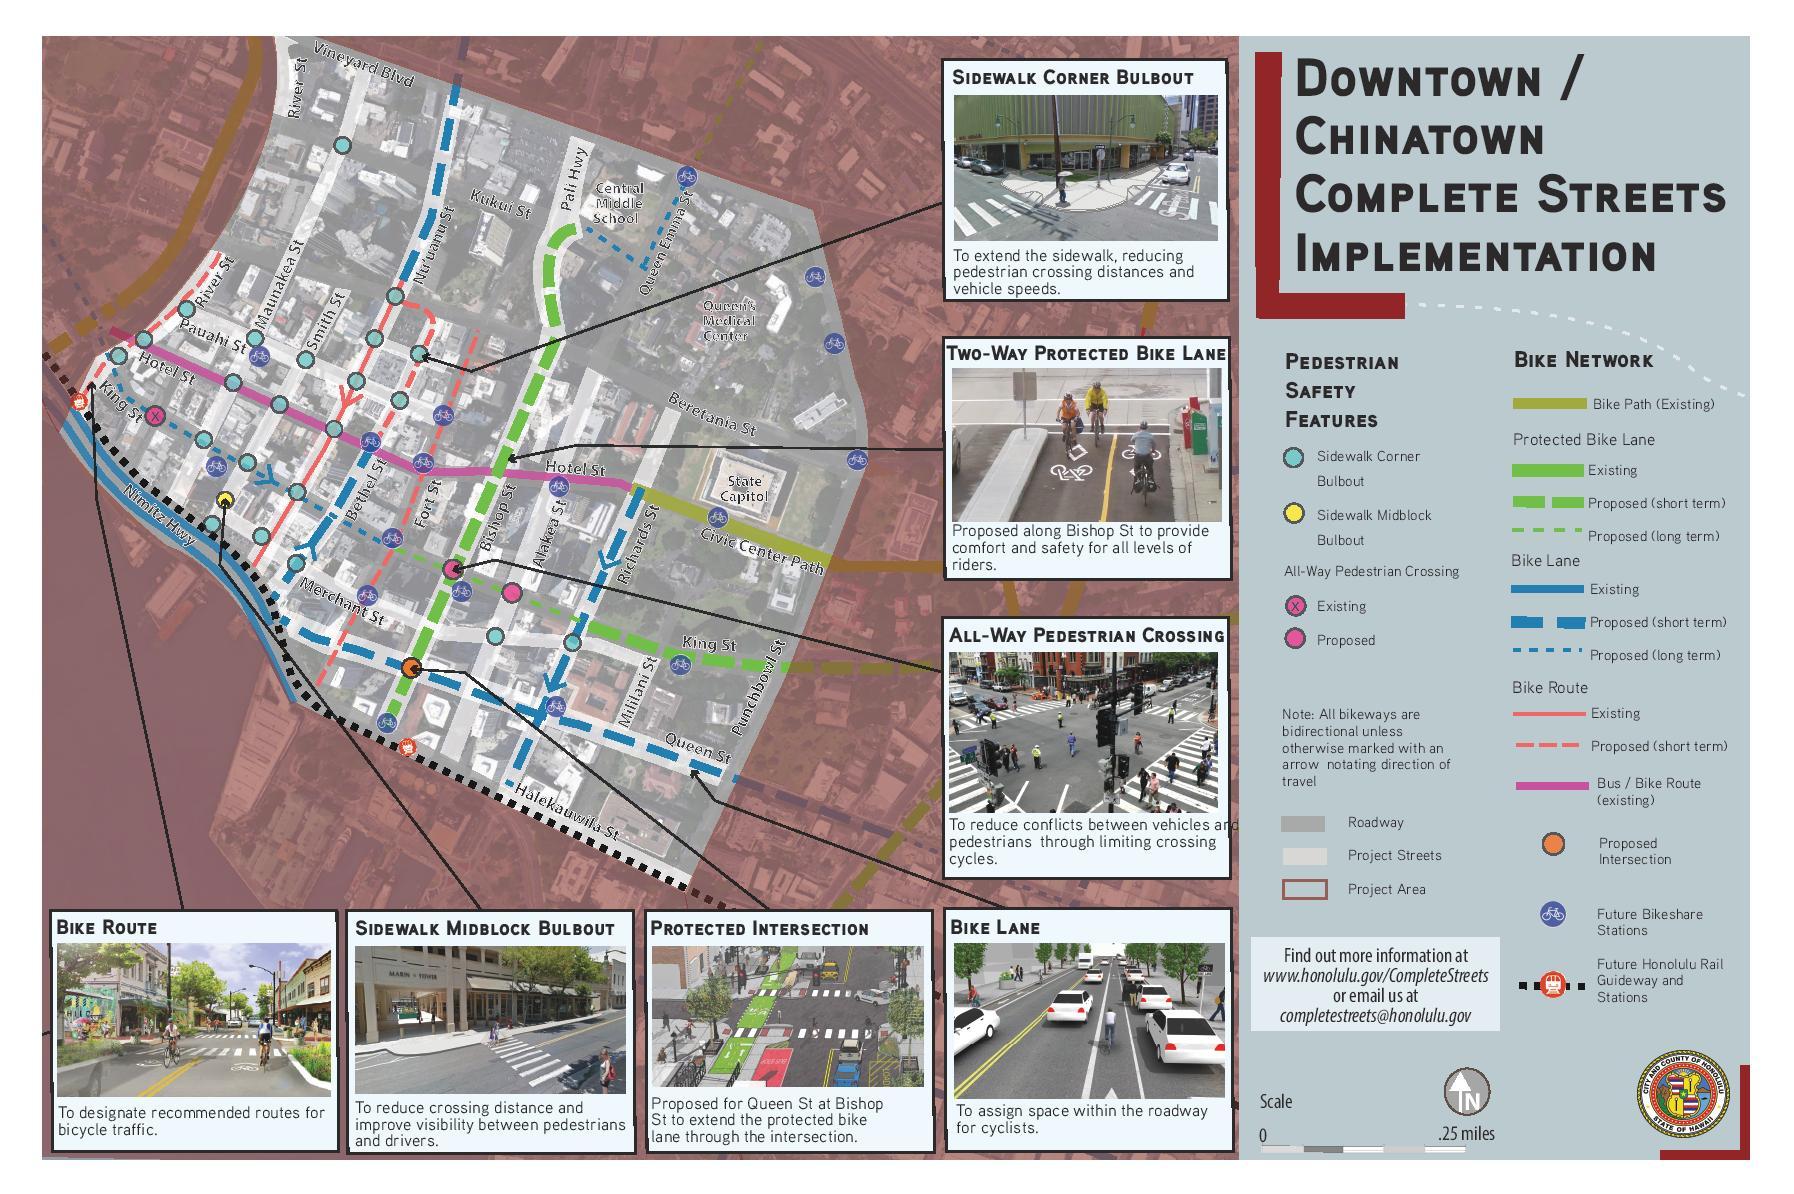 170201_Downtown_Chinatown_CS_Map_FactSheet_-page-001.jpg